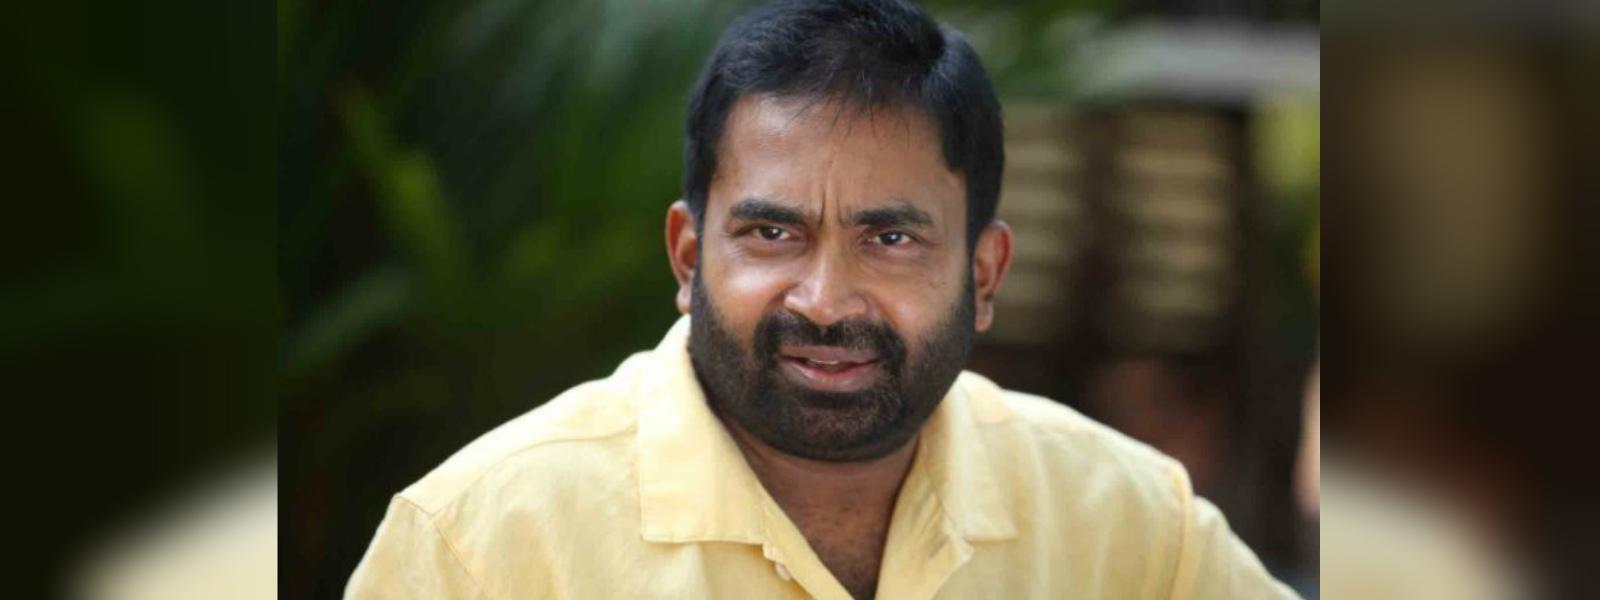 Ranjith Siyambalapitiya summoned by the PCoI